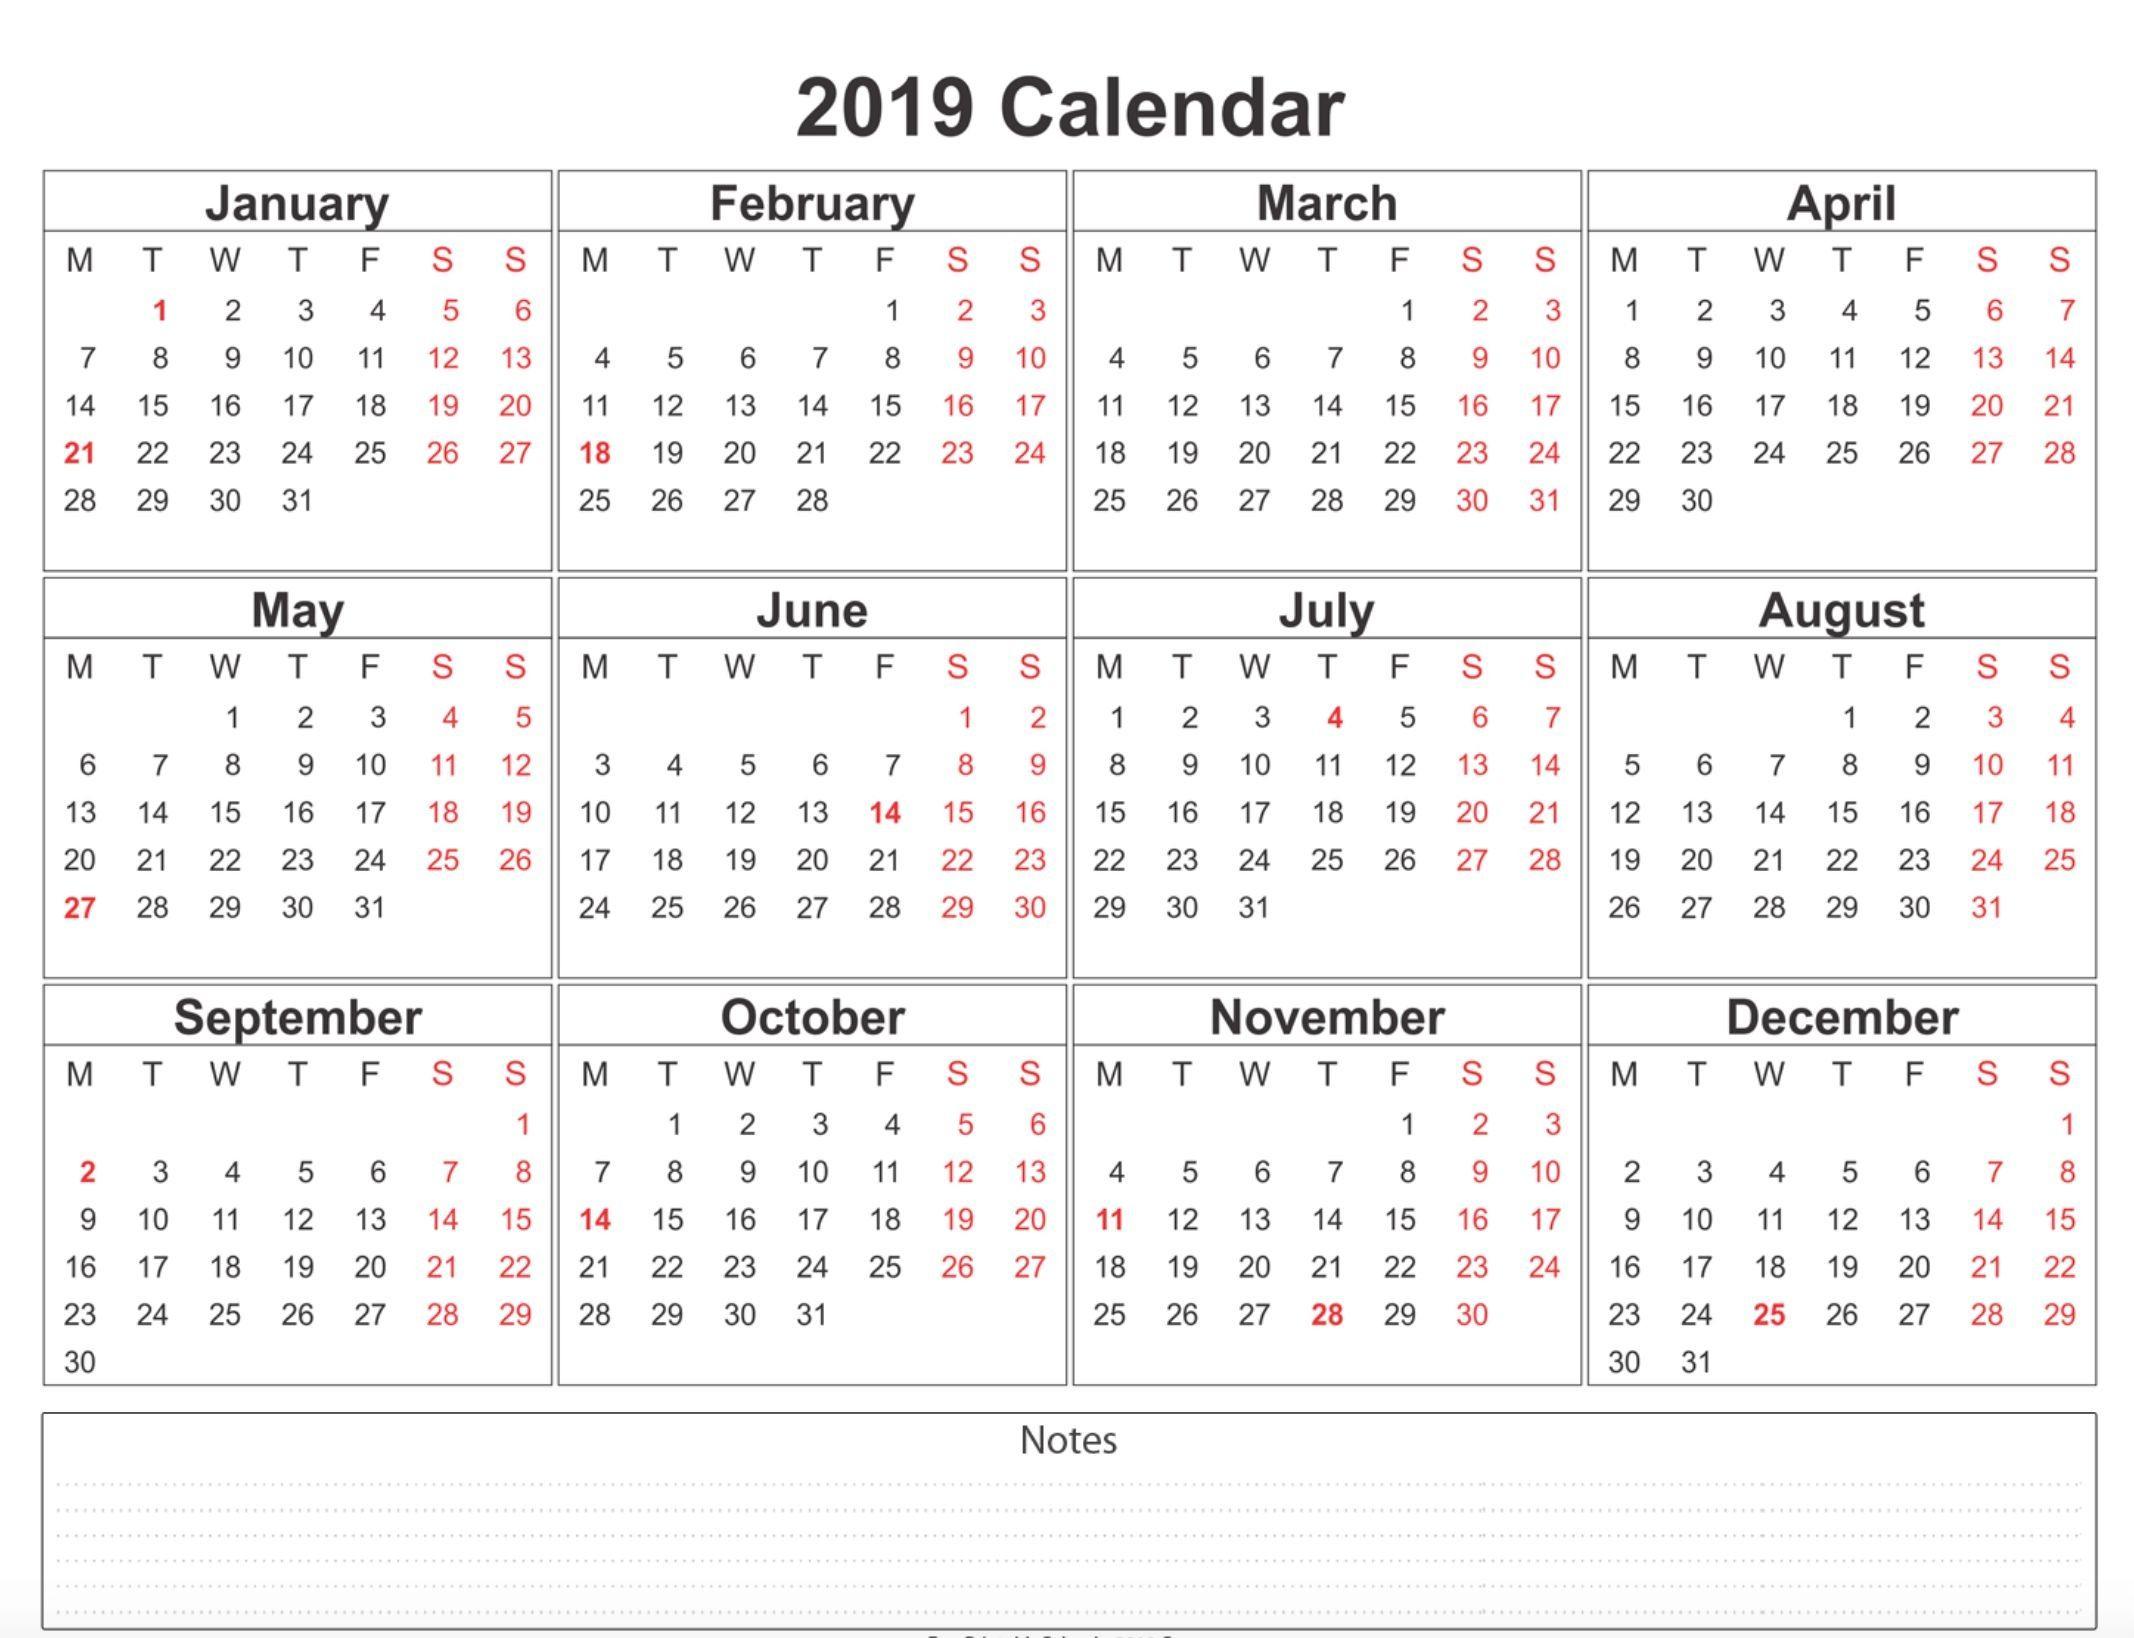 2019 Weekly Calendar Printable | 2019 Calendars | 12 Month Calendar inside Calendar Blank Planner Months 18 School Year